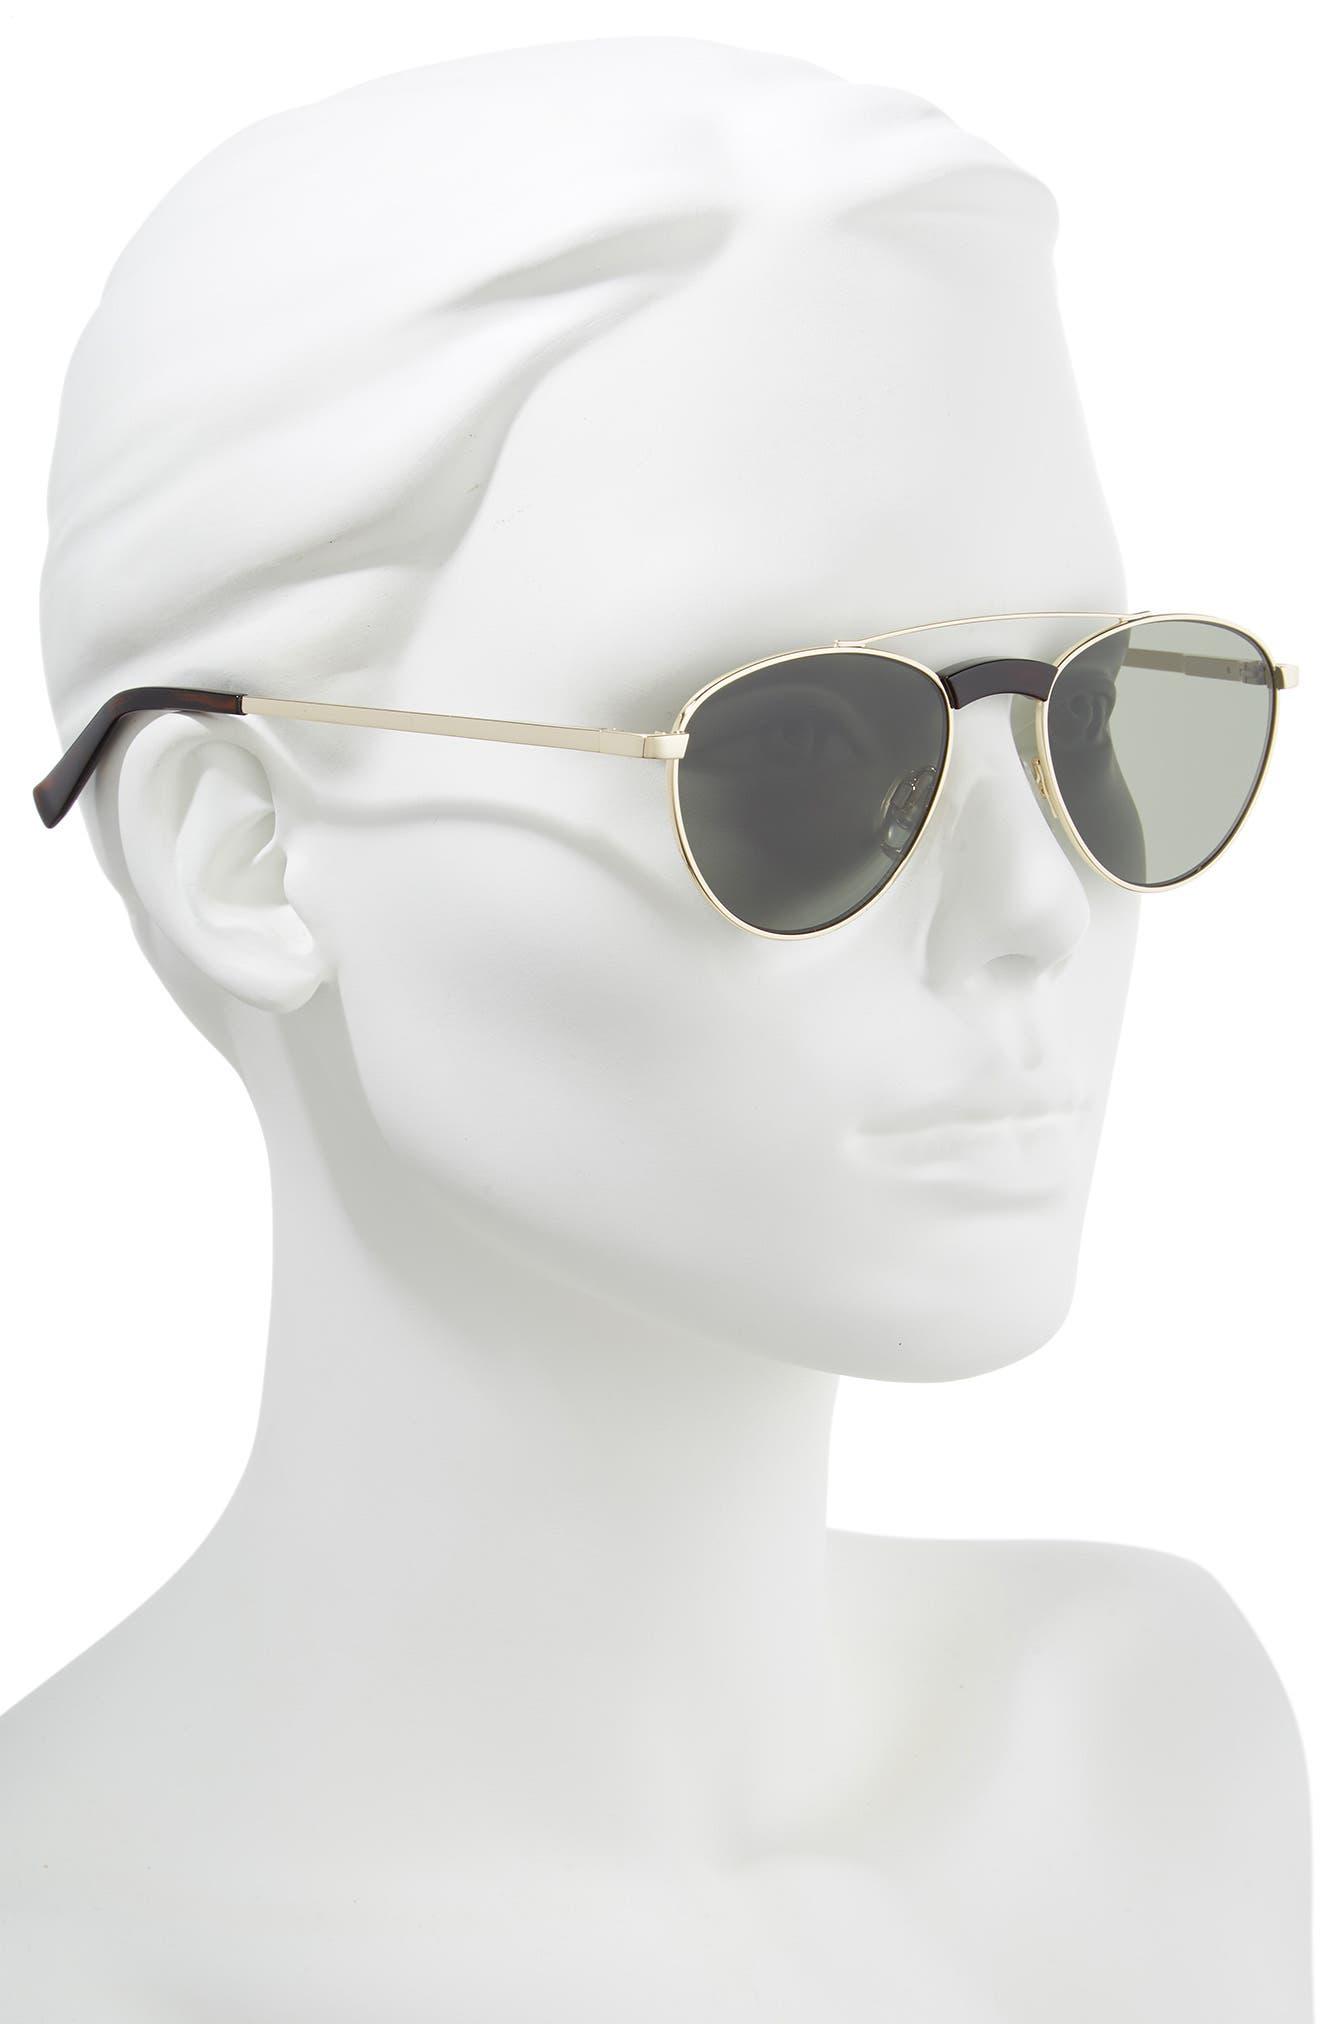 Rocket Man 52mm Aviator Sunglasses,                             Alternate thumbnail 2, color,                             BRIGHT GOLD